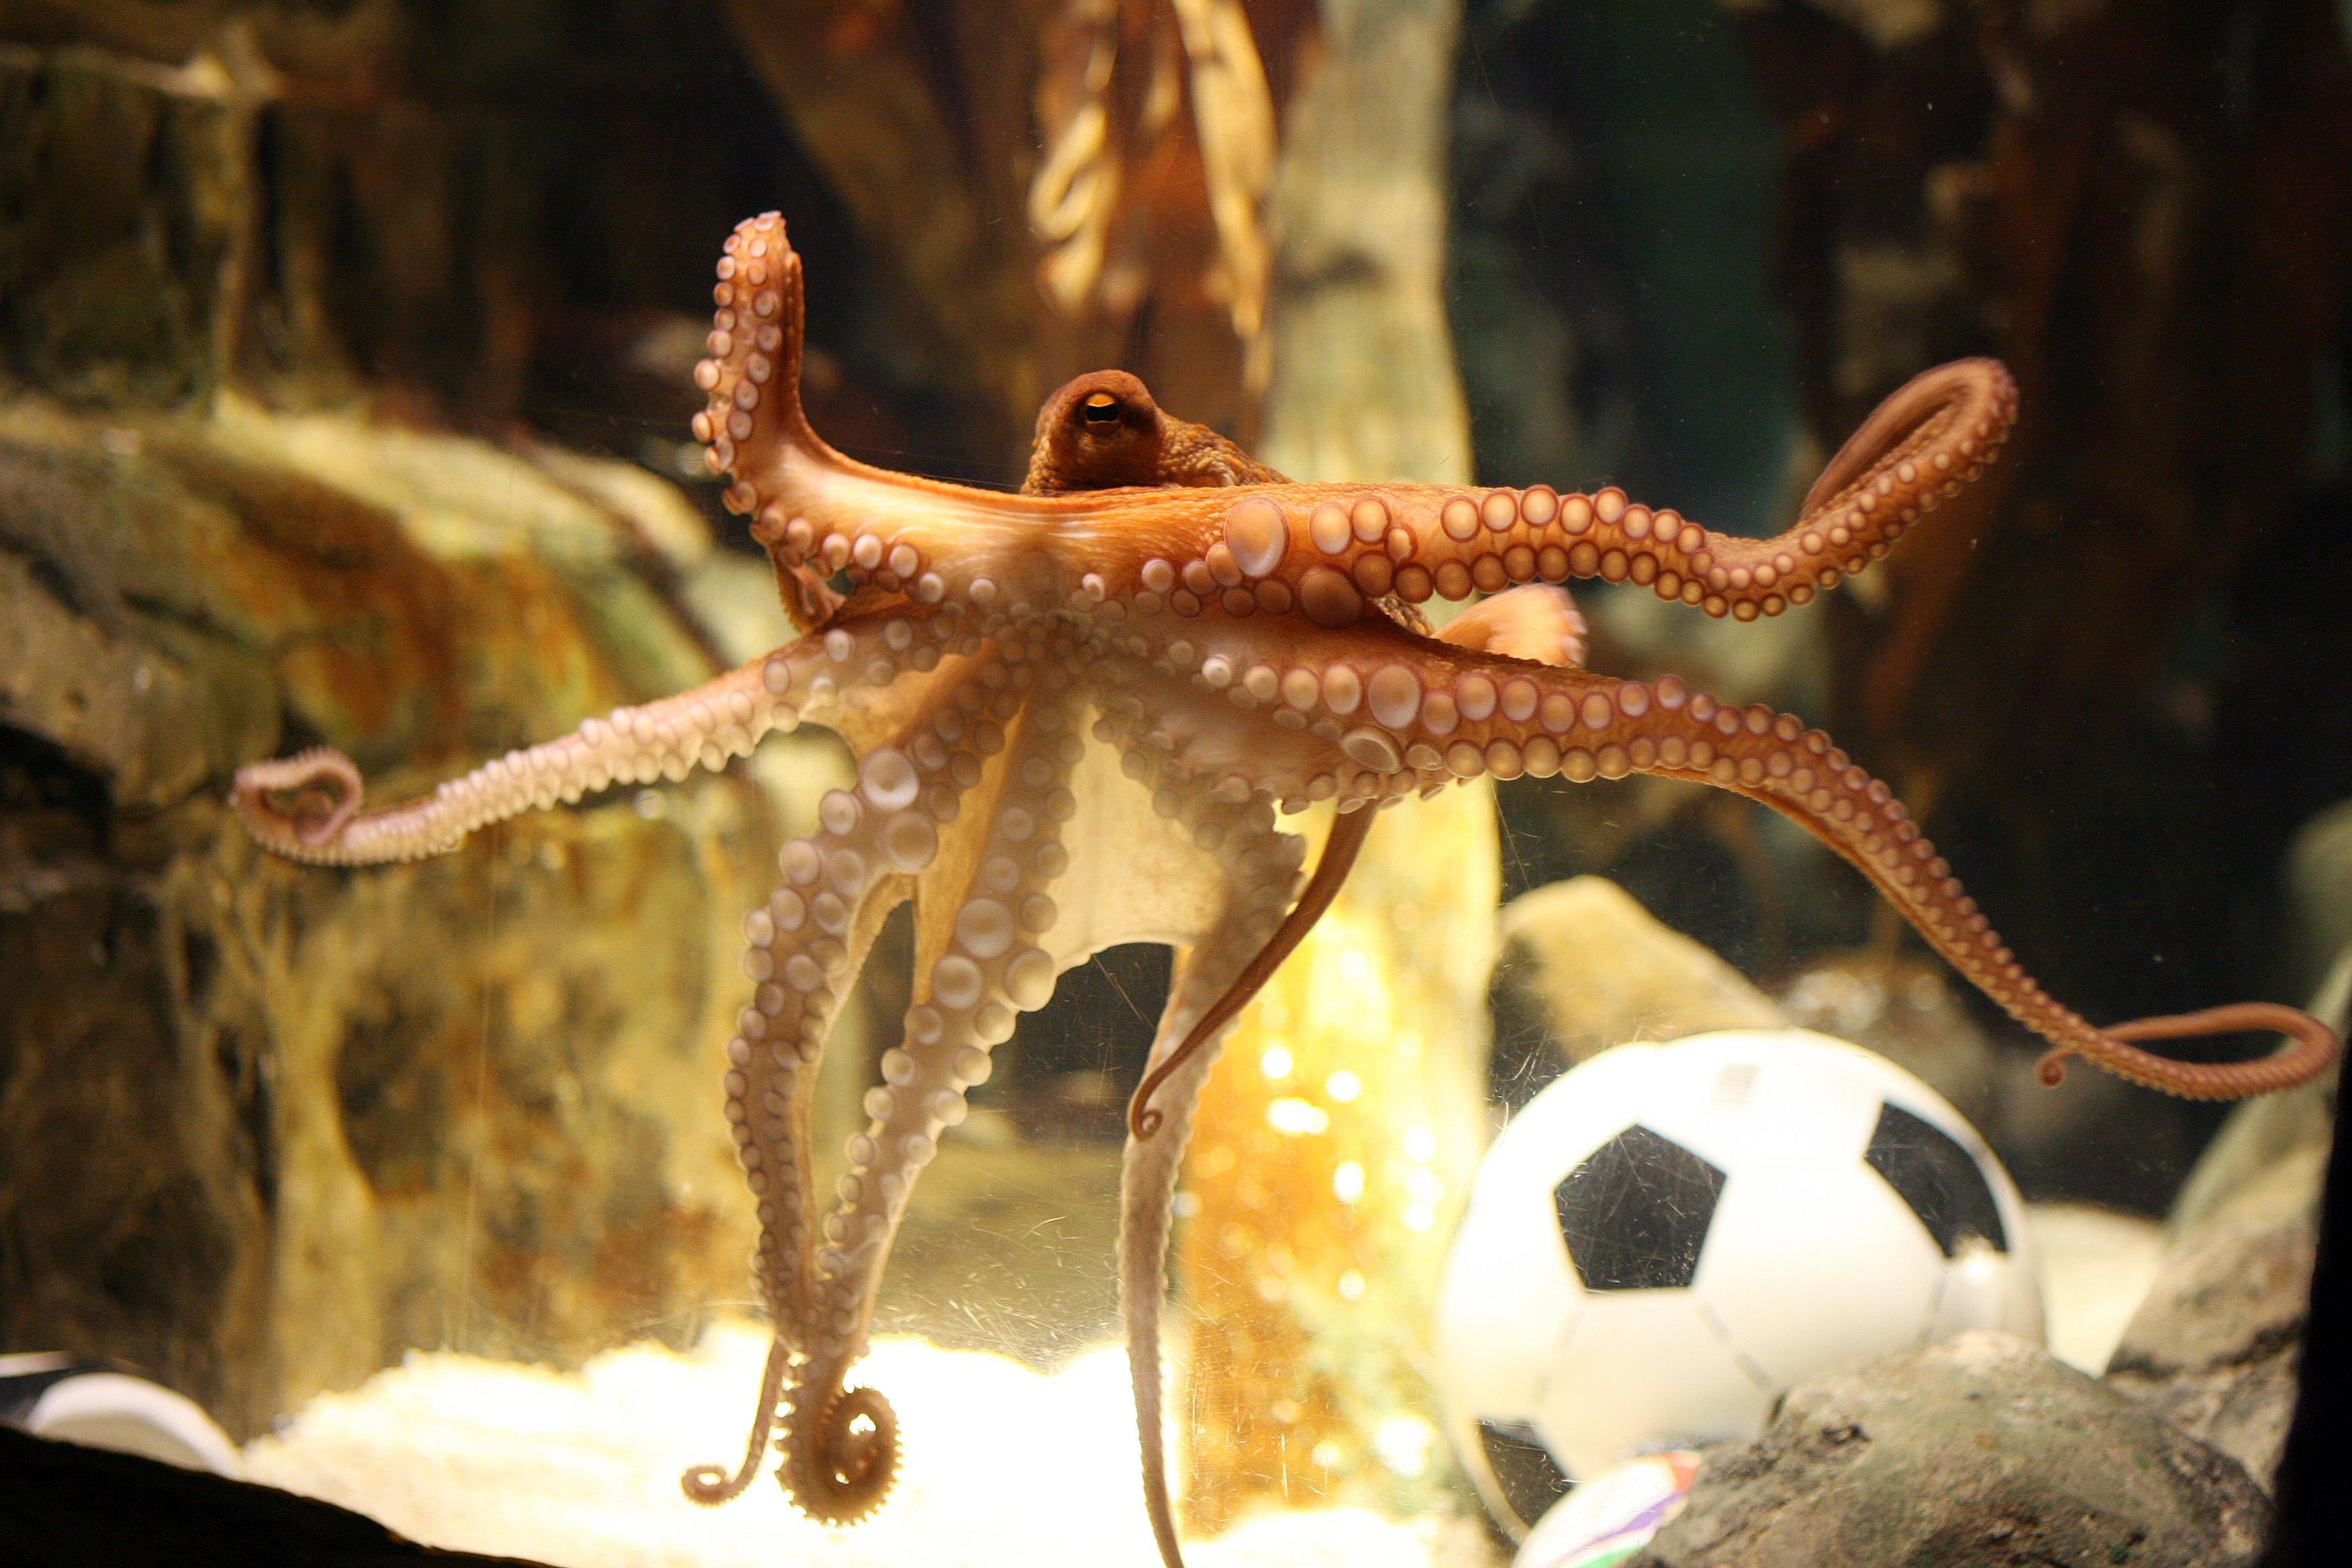 wilma flintstone and the octopus